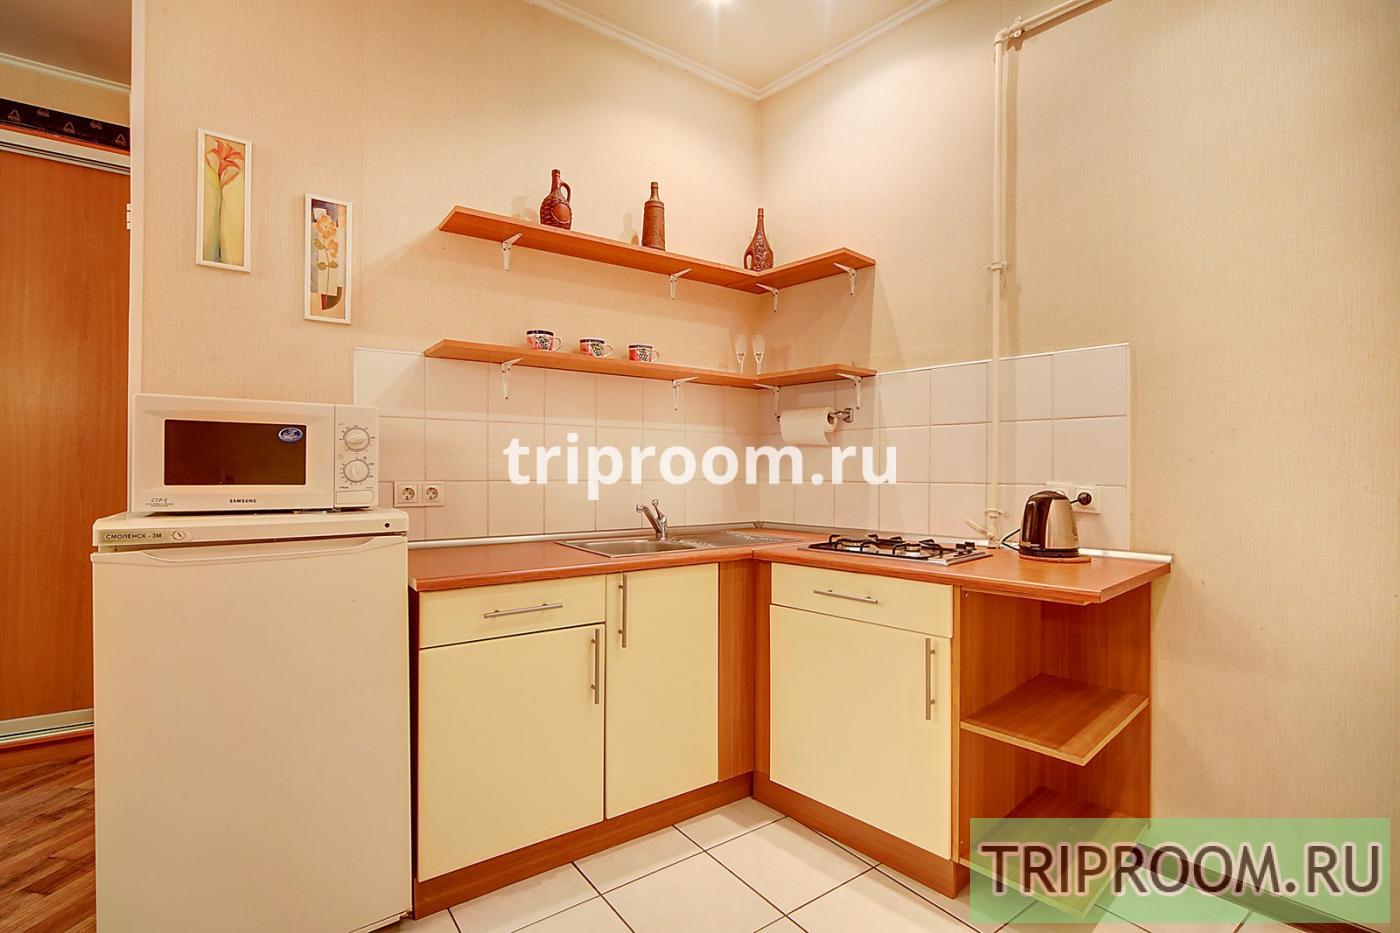 1-комнатная квартира посуточно (вариант № 15082), ул. Невский проспект, фото № 8